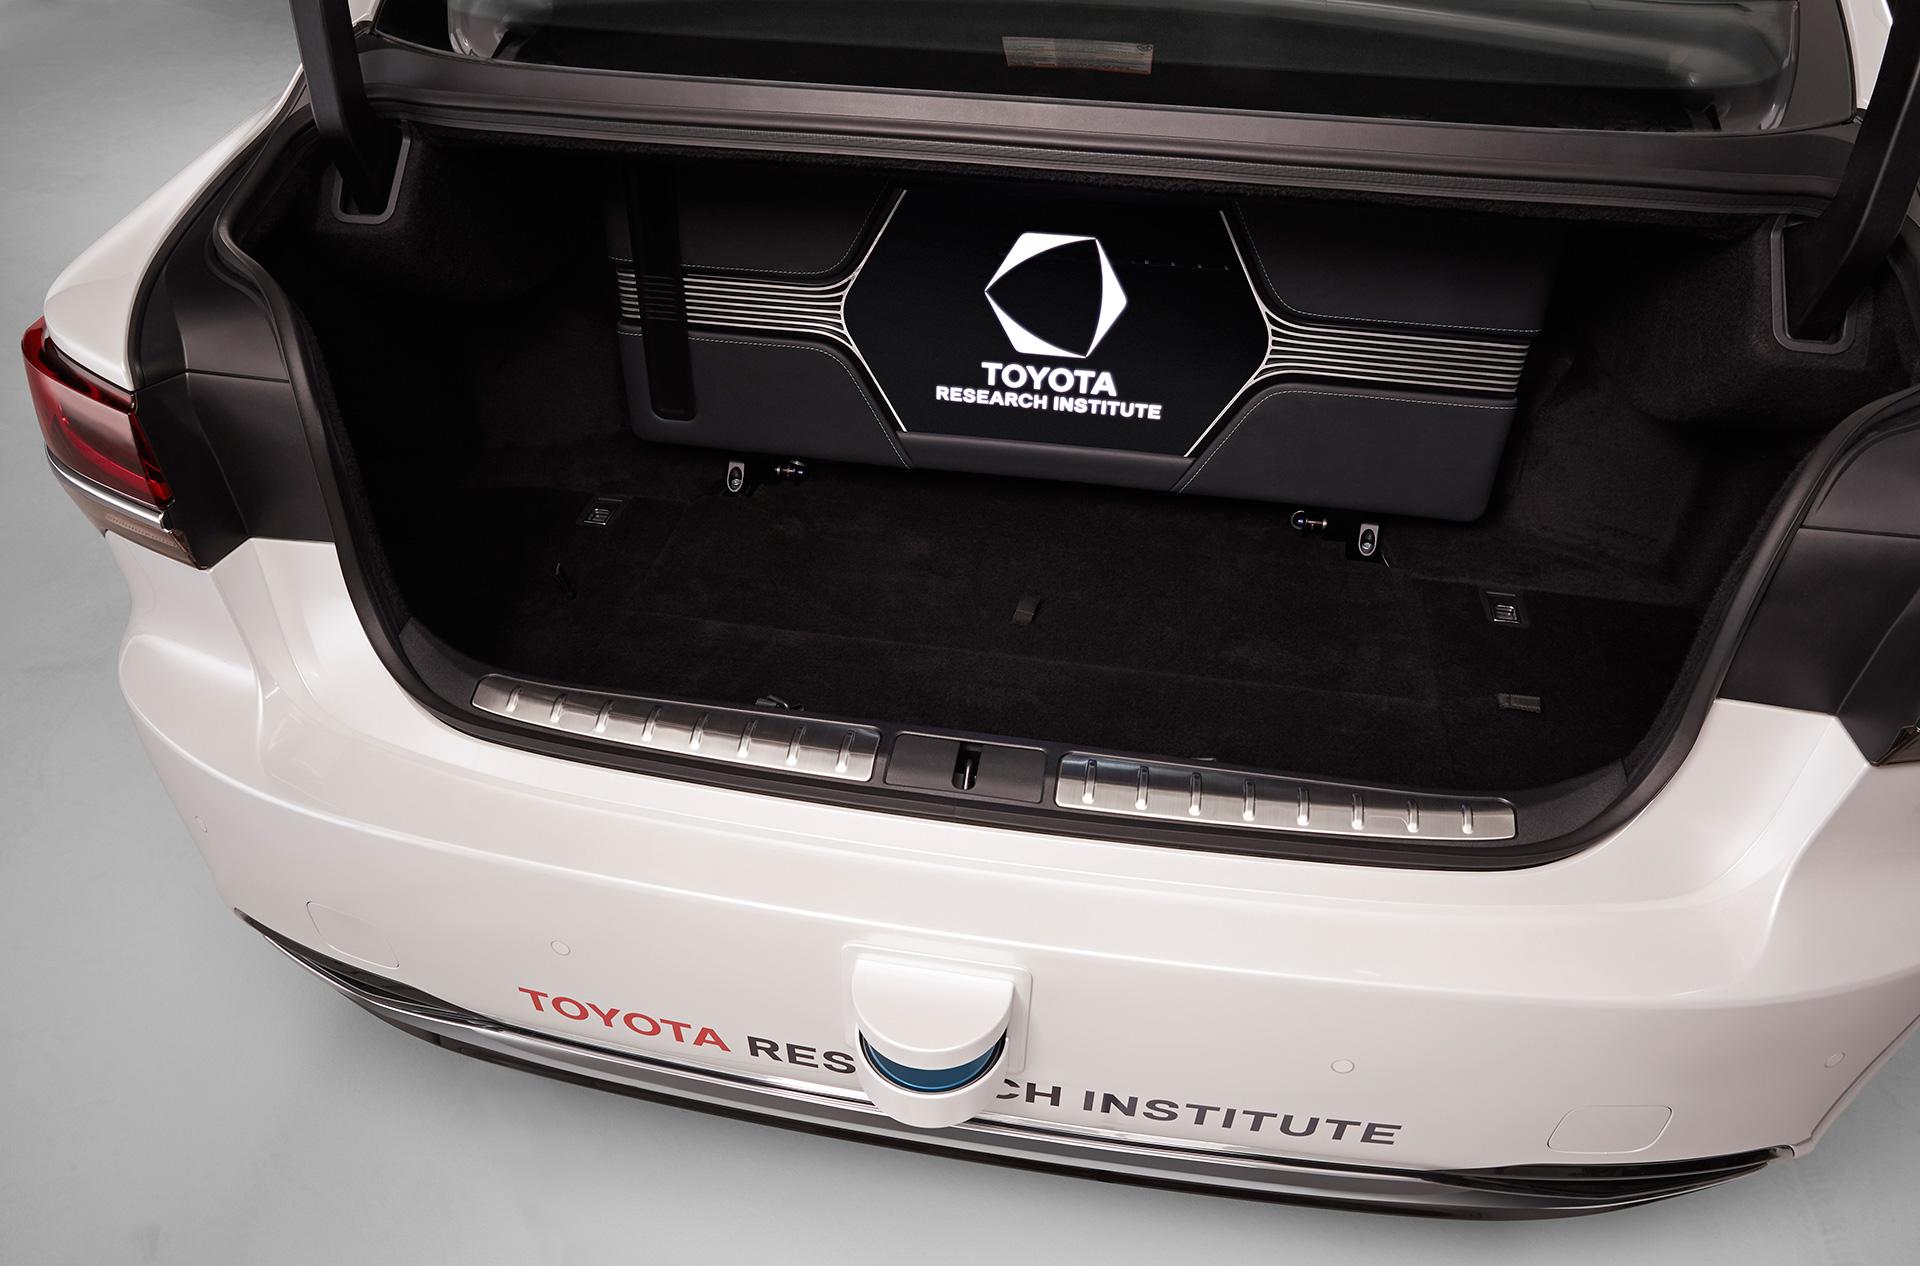 「【CES 2019】新型レクサスLSをベースとした自動運転実験車「TRI-P4」を披露」の2枚目の画像